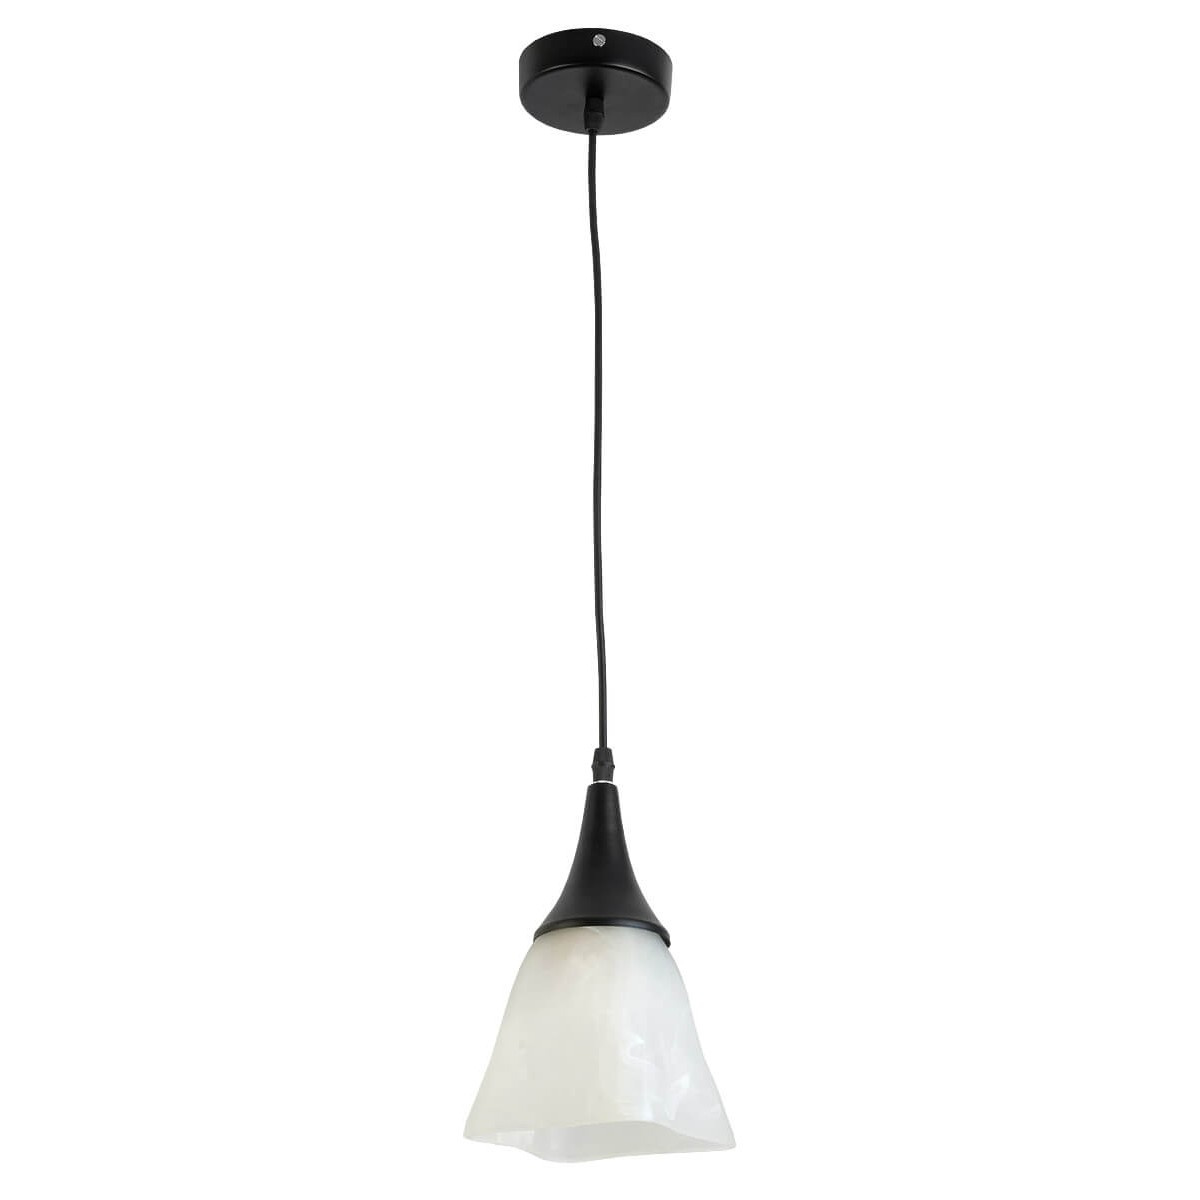 Подвесной светильник Toplight Jillian TL4410D-01BL